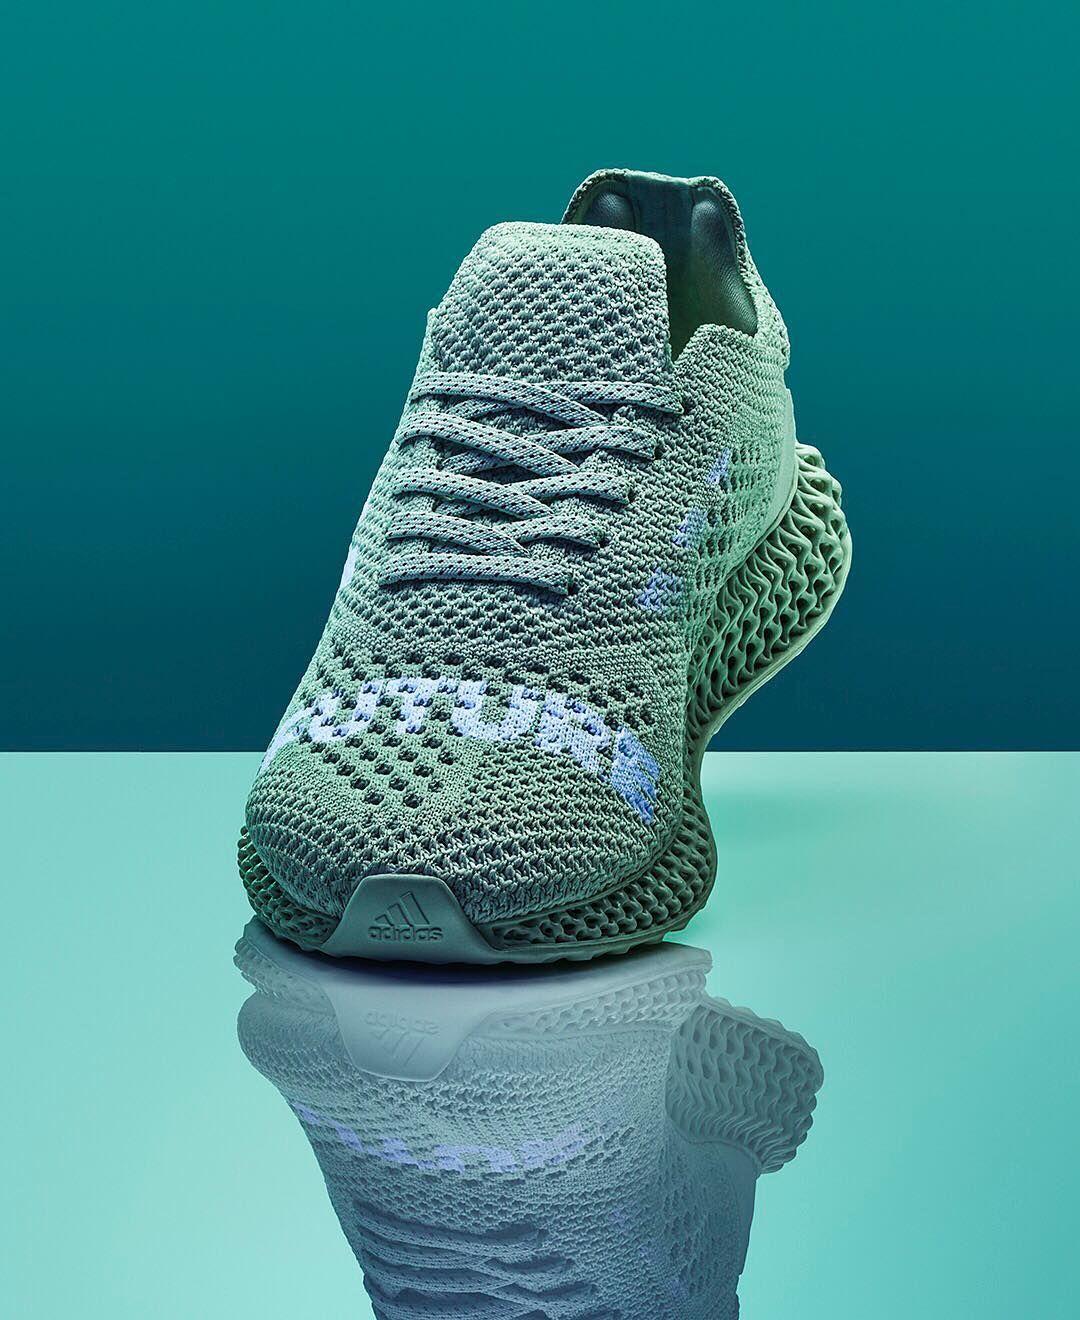 Now the raffle for adidas Consortium Future Runner 4D x